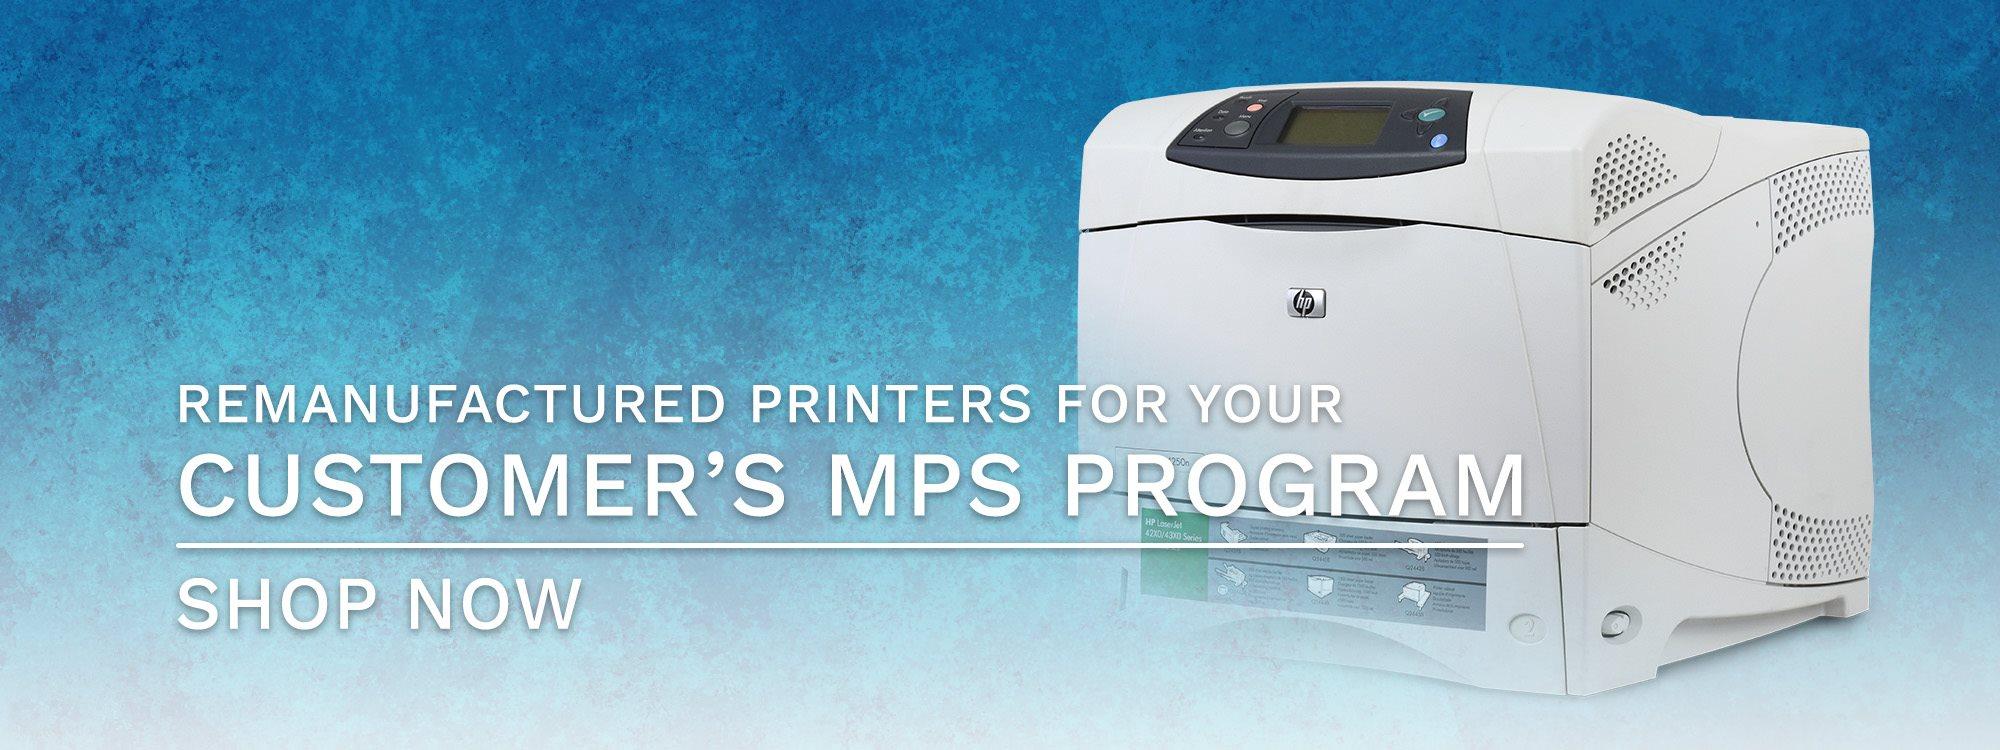 printer-reman-mps-program-slider